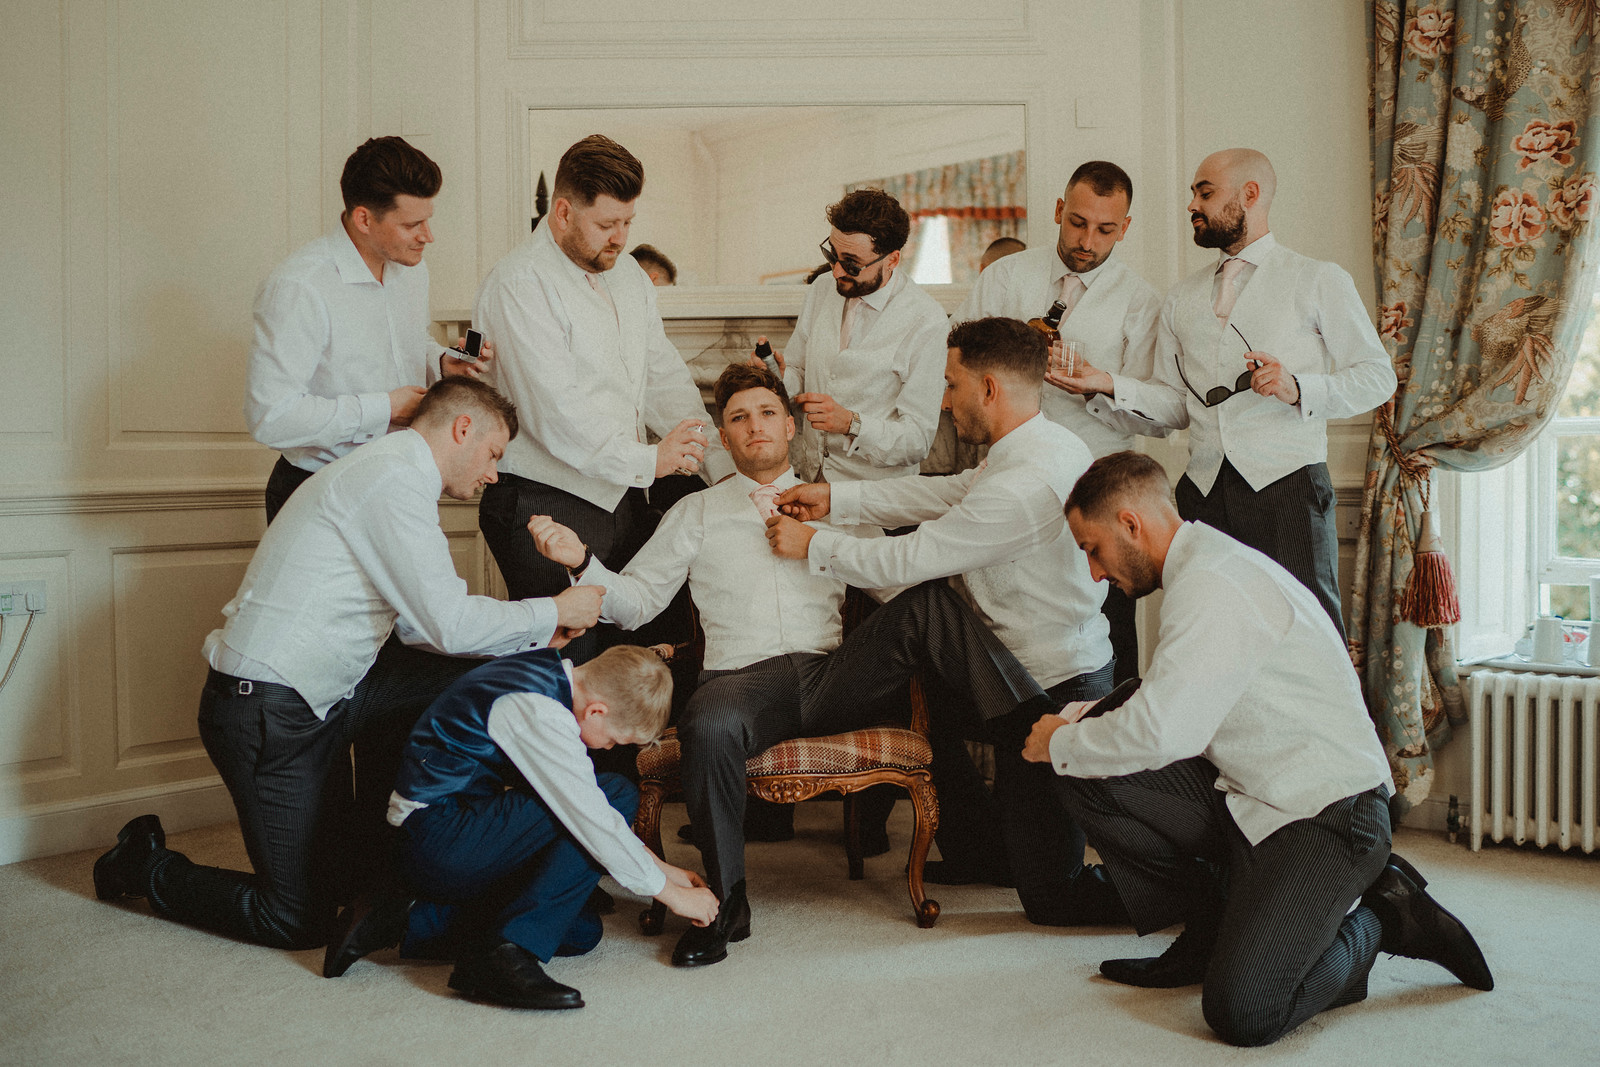 Fun Groomsmen Wedding Photo - Gosfield Hall Wedding Photo